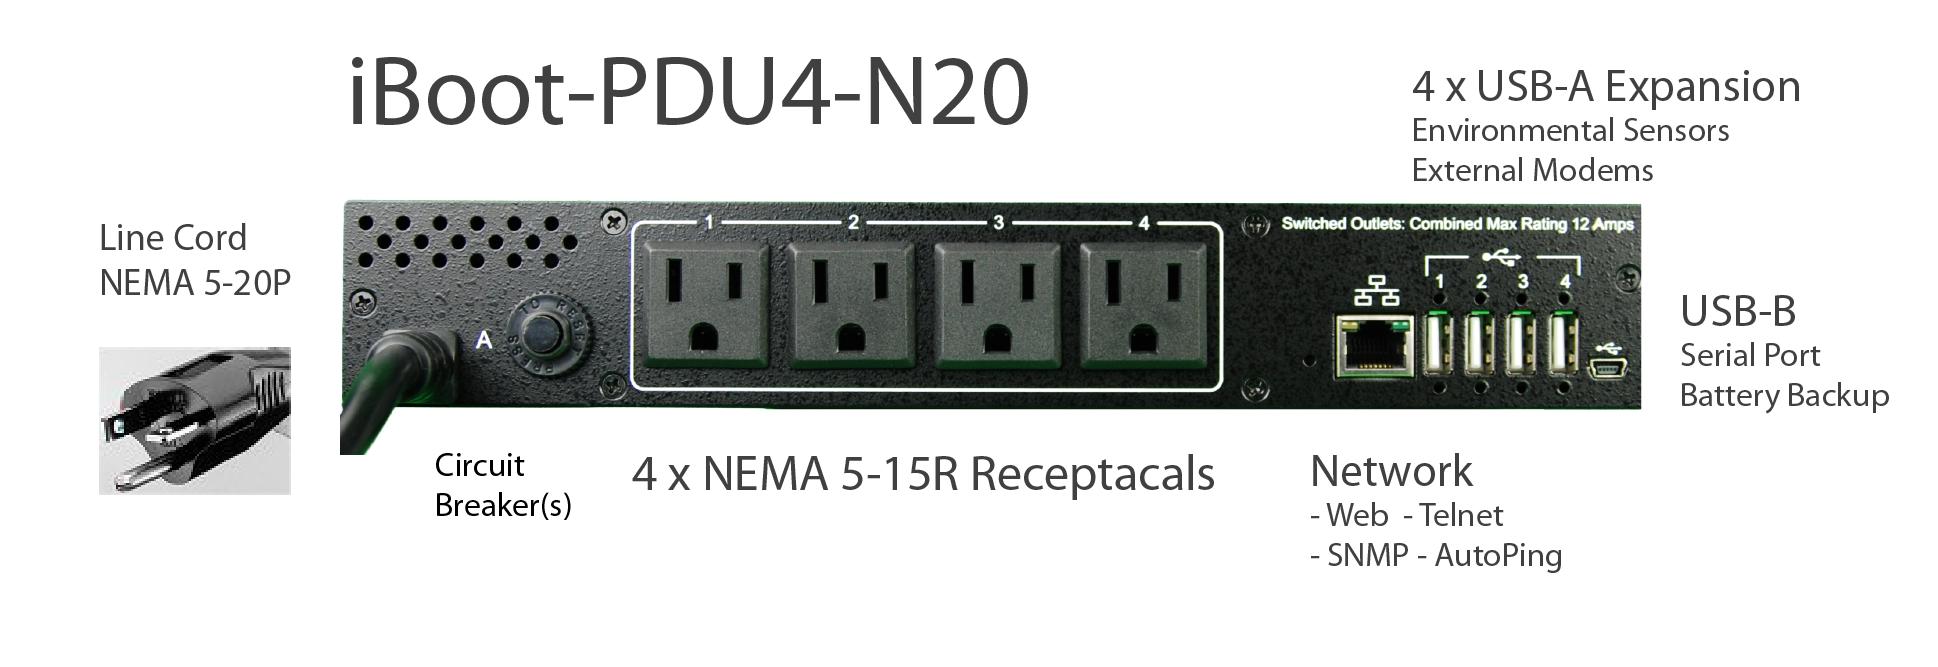 iBoot-PDU4-N20 for Remote Reboot,1 x NEMA 5-15P.